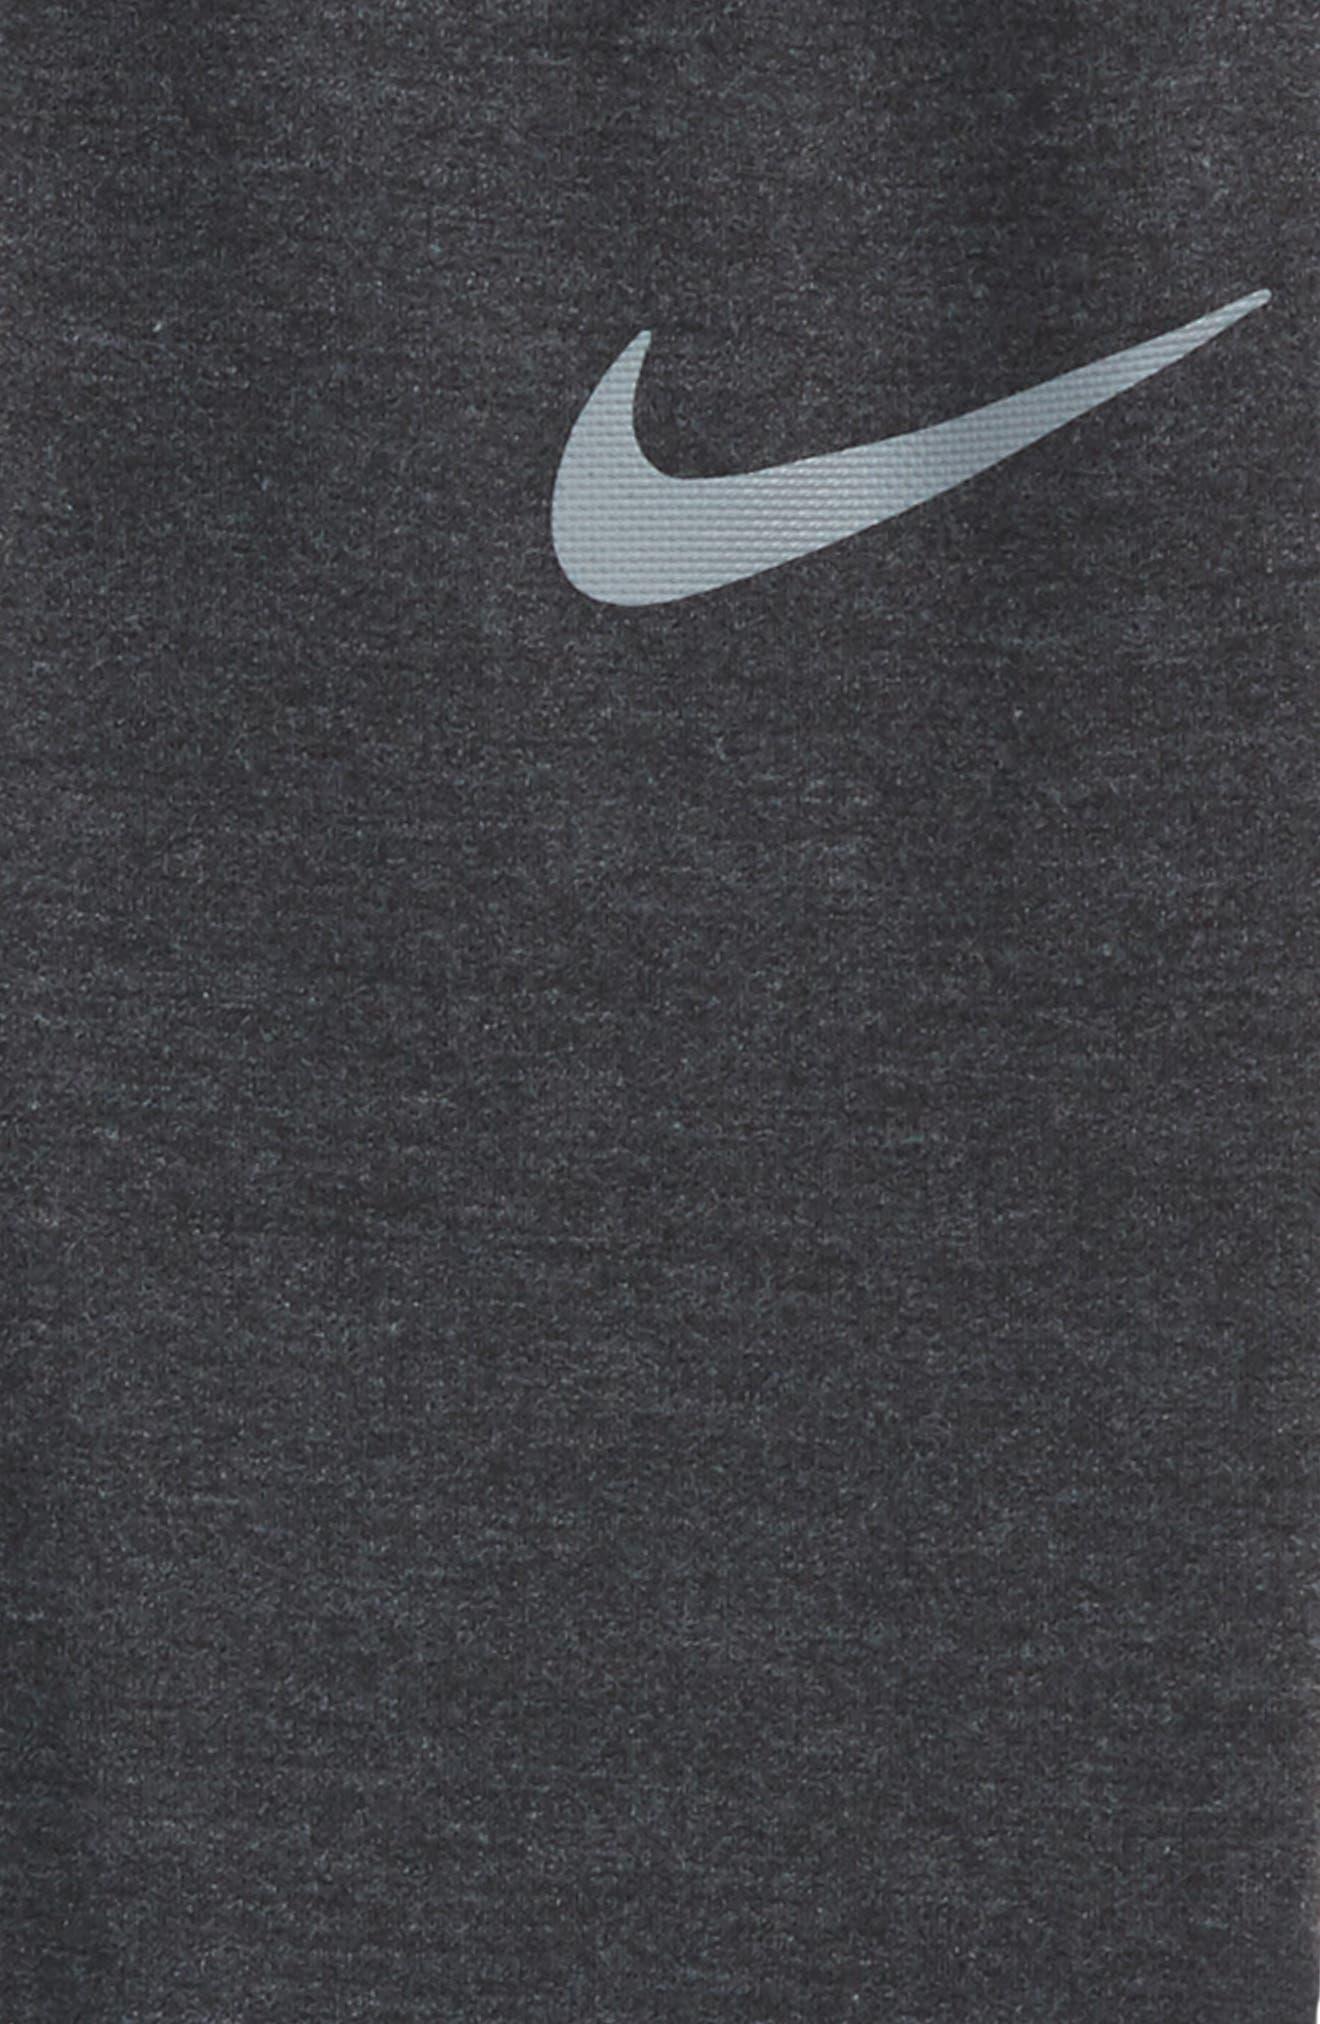 Dry Sweatpants,                             Alternate thumbnail 2, color,                             010